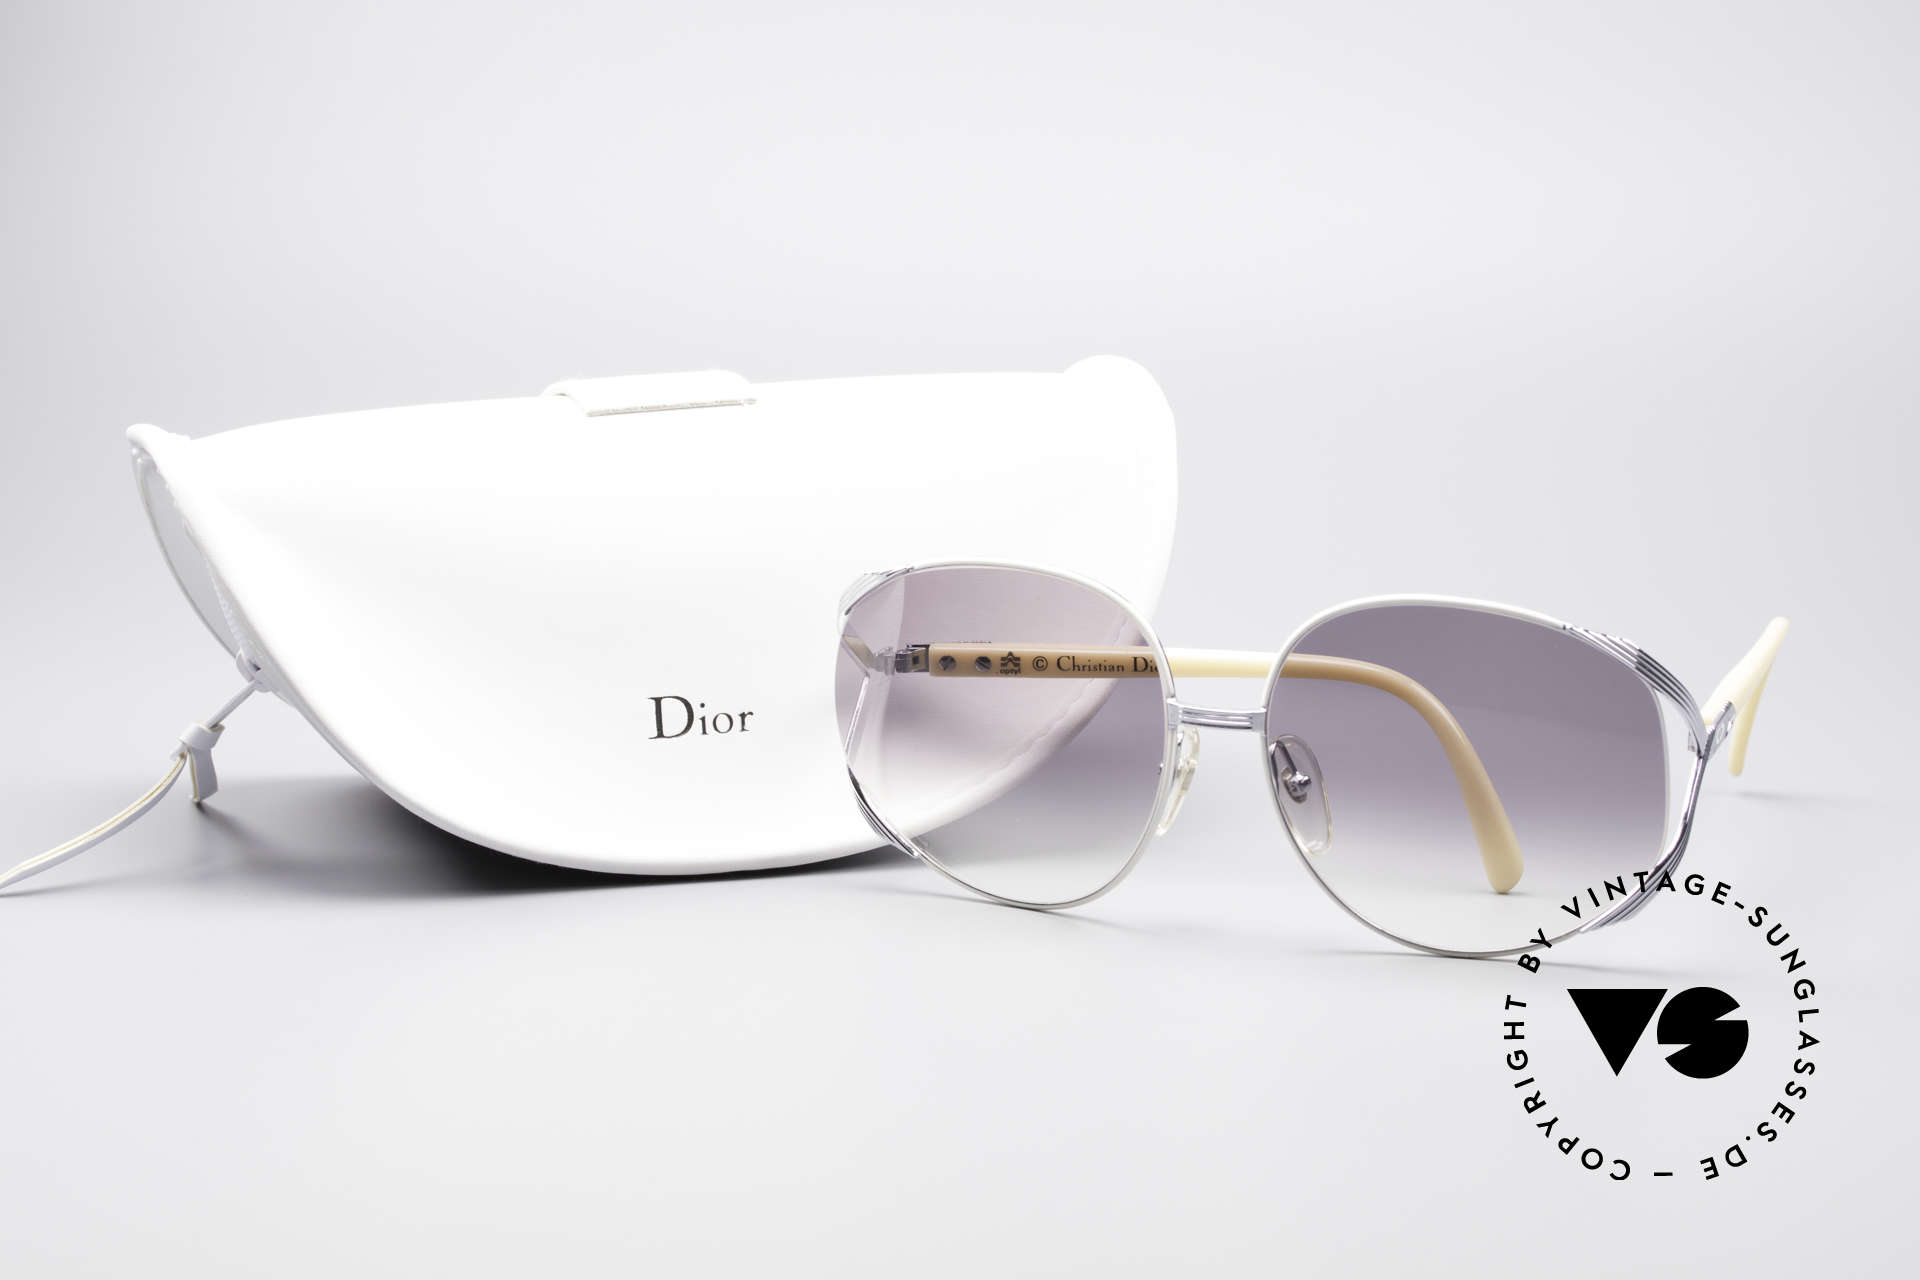 Christian Dior 2250 Amy Adams American Hustle, NO RETRO SUNGLASSES; but a very rare unworn Original, Made for Women